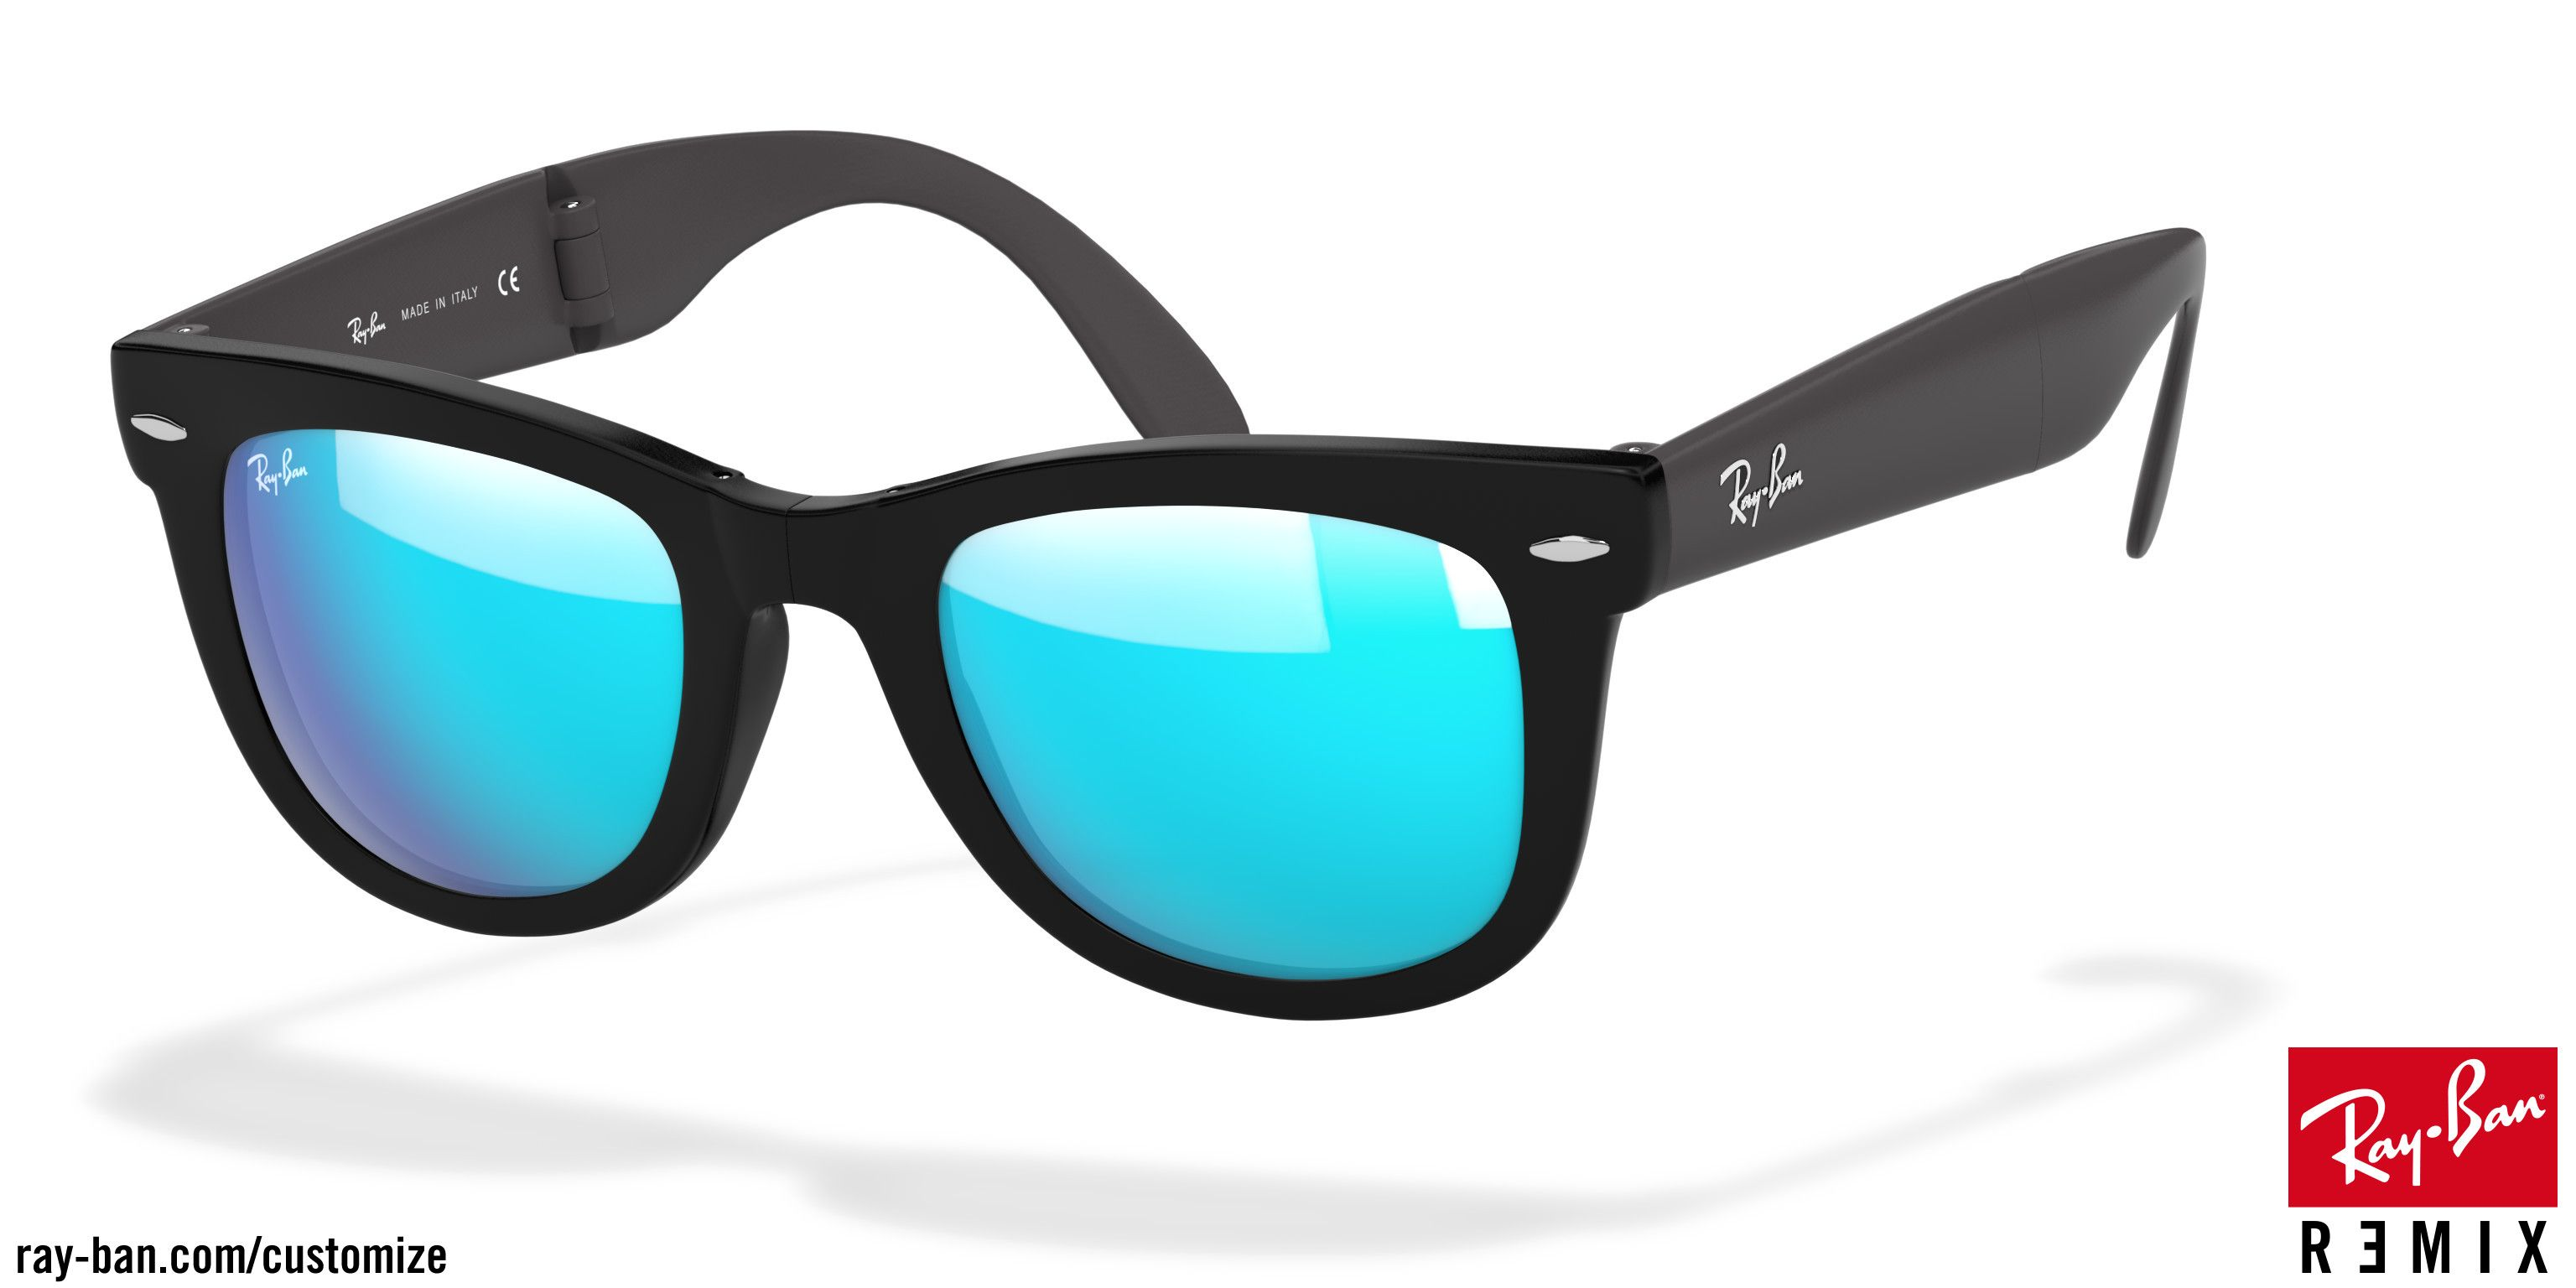 06498f8ab0 Look whos looking at this new Ray-Ban wayfarer folding sunglasses